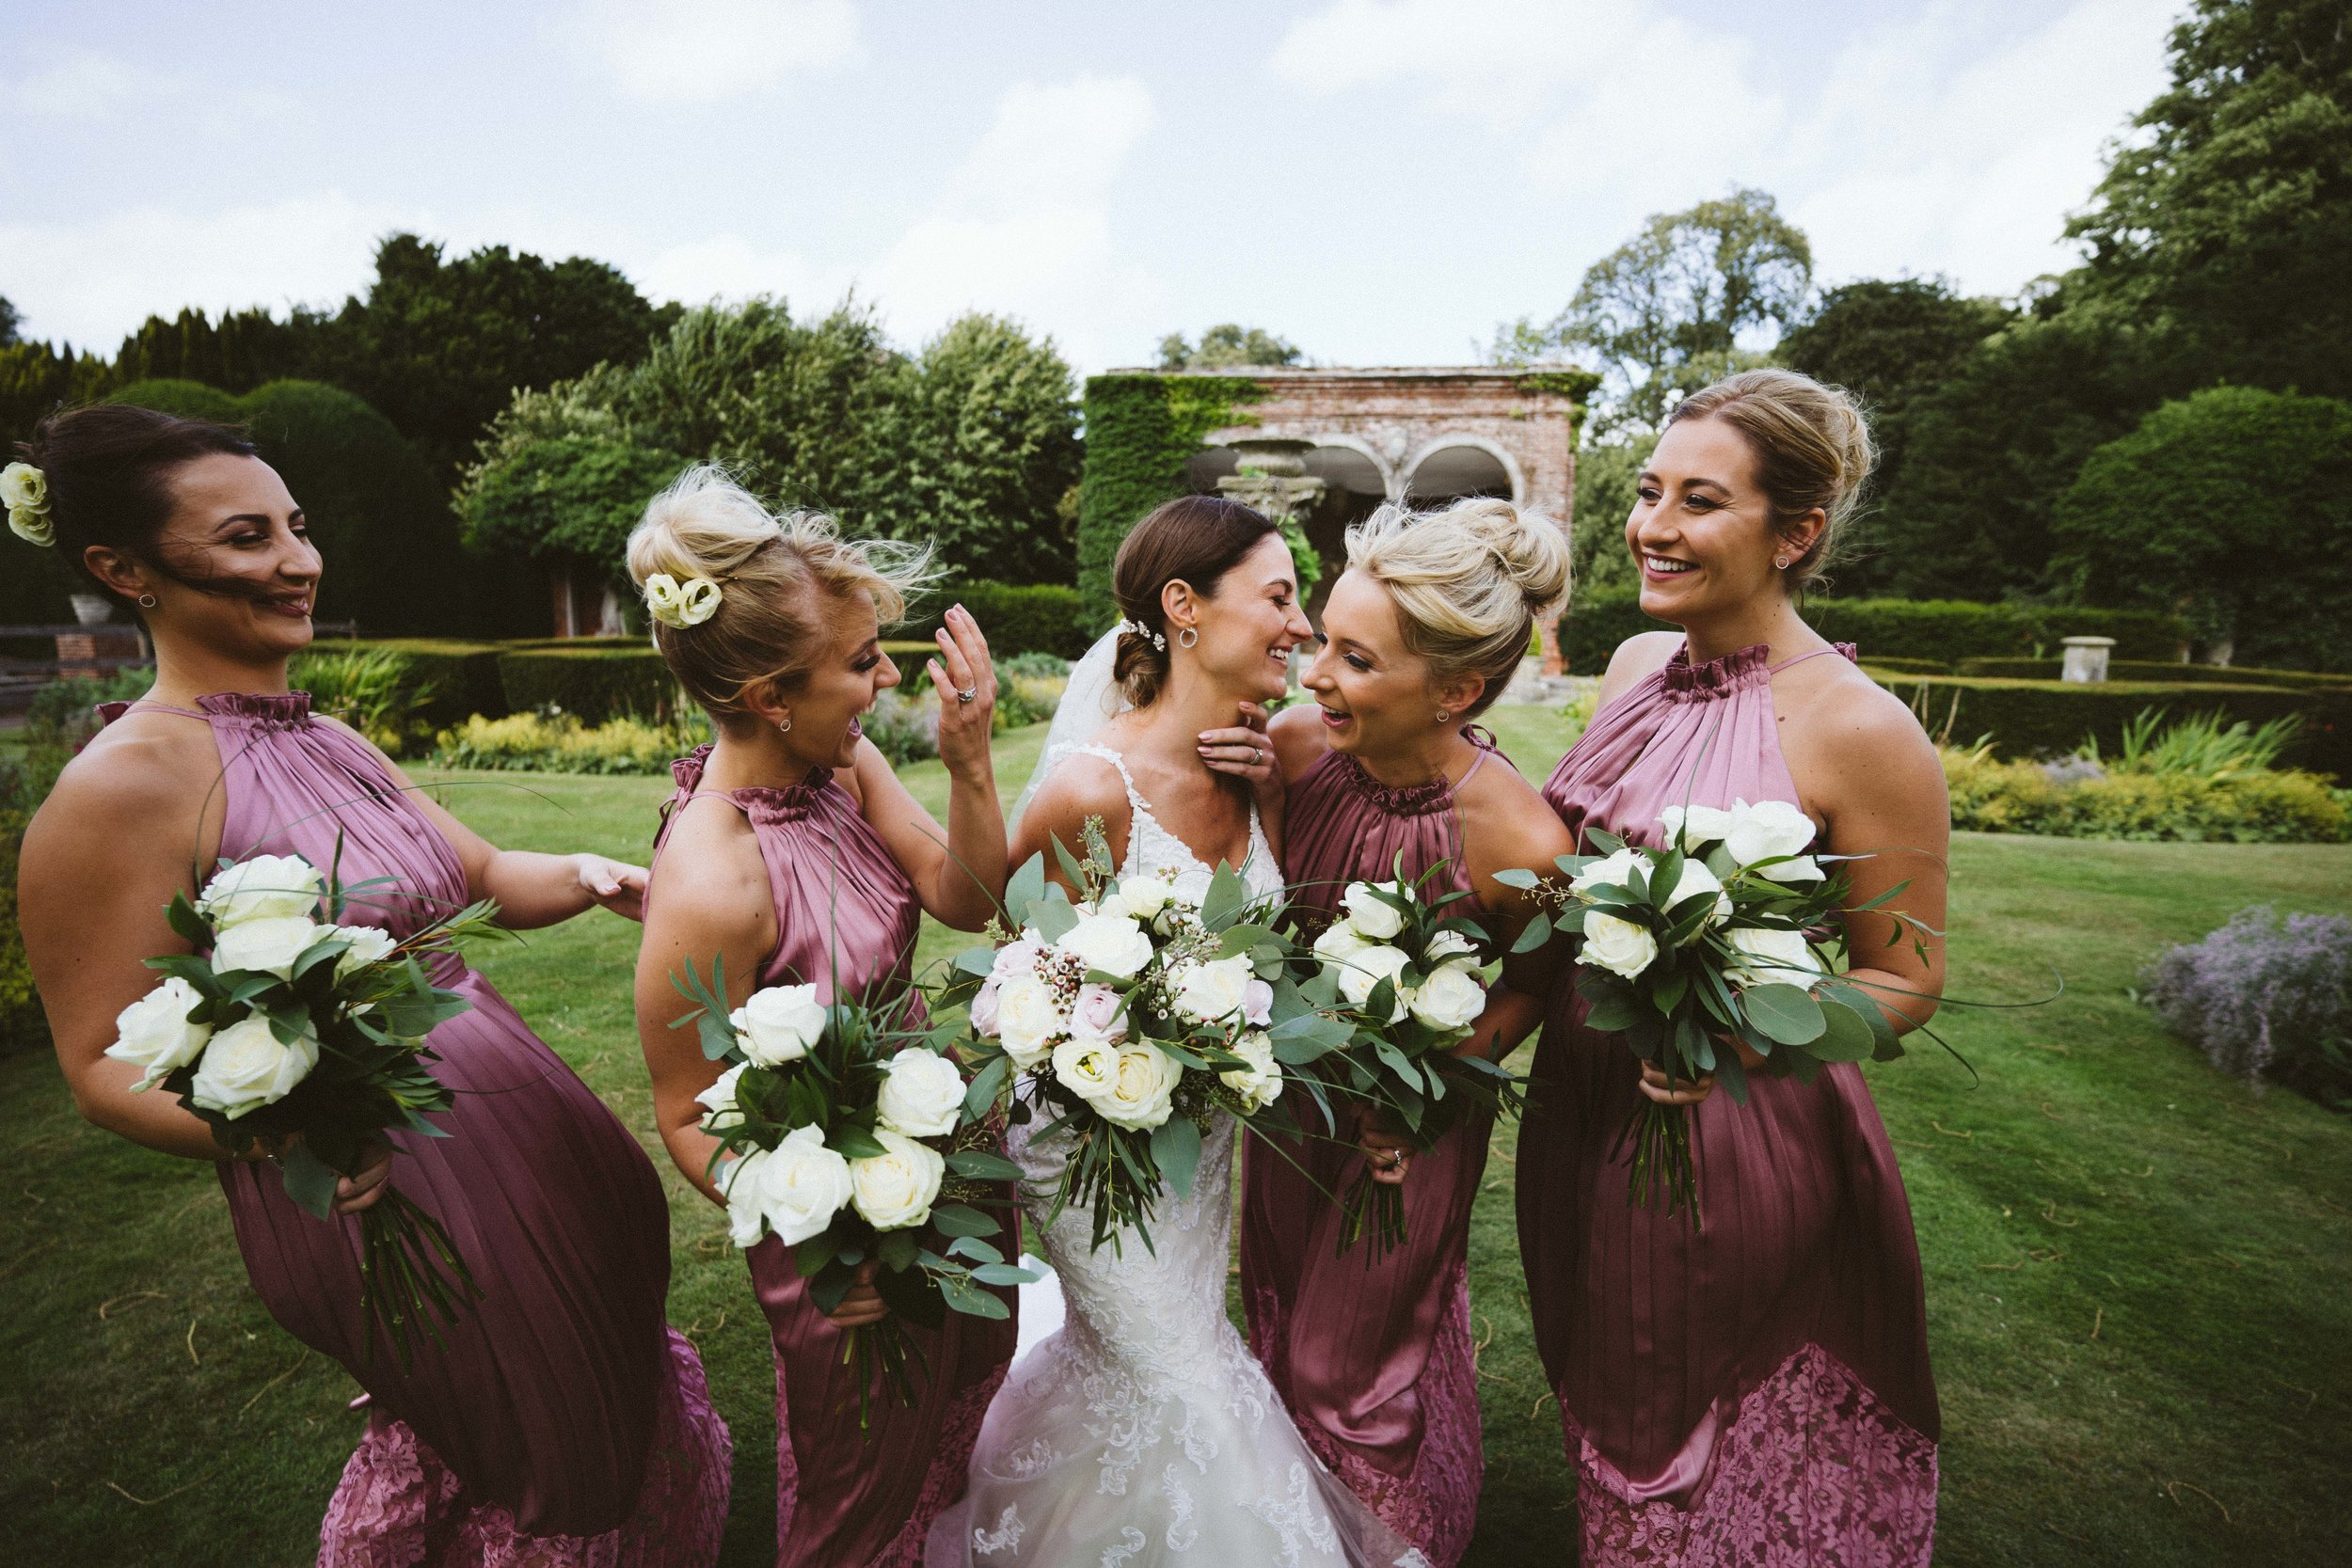 kent-wedding-photographer-105131.jpg